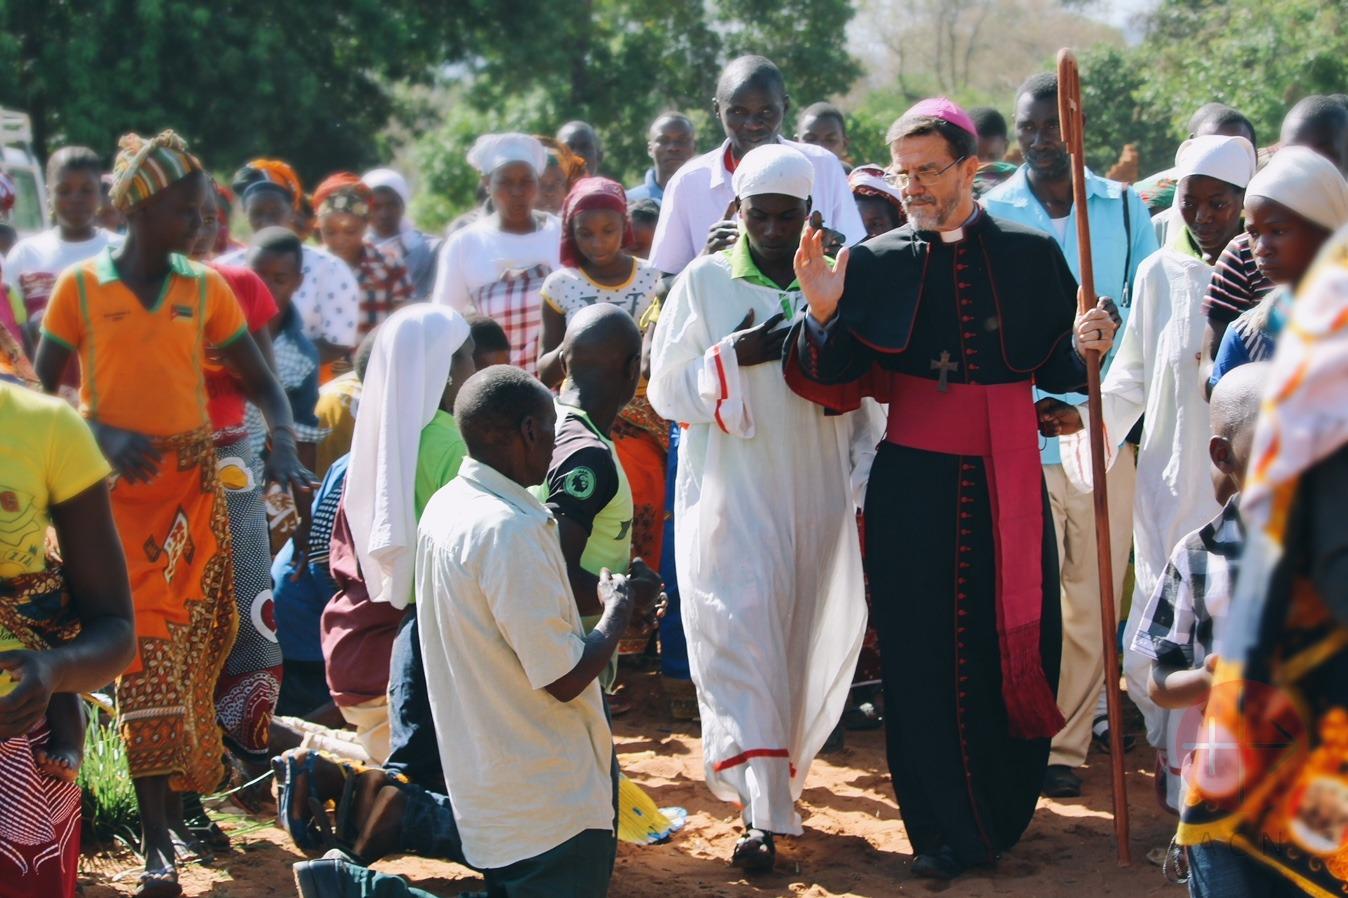 Mozambique obispo de Pemba con gente